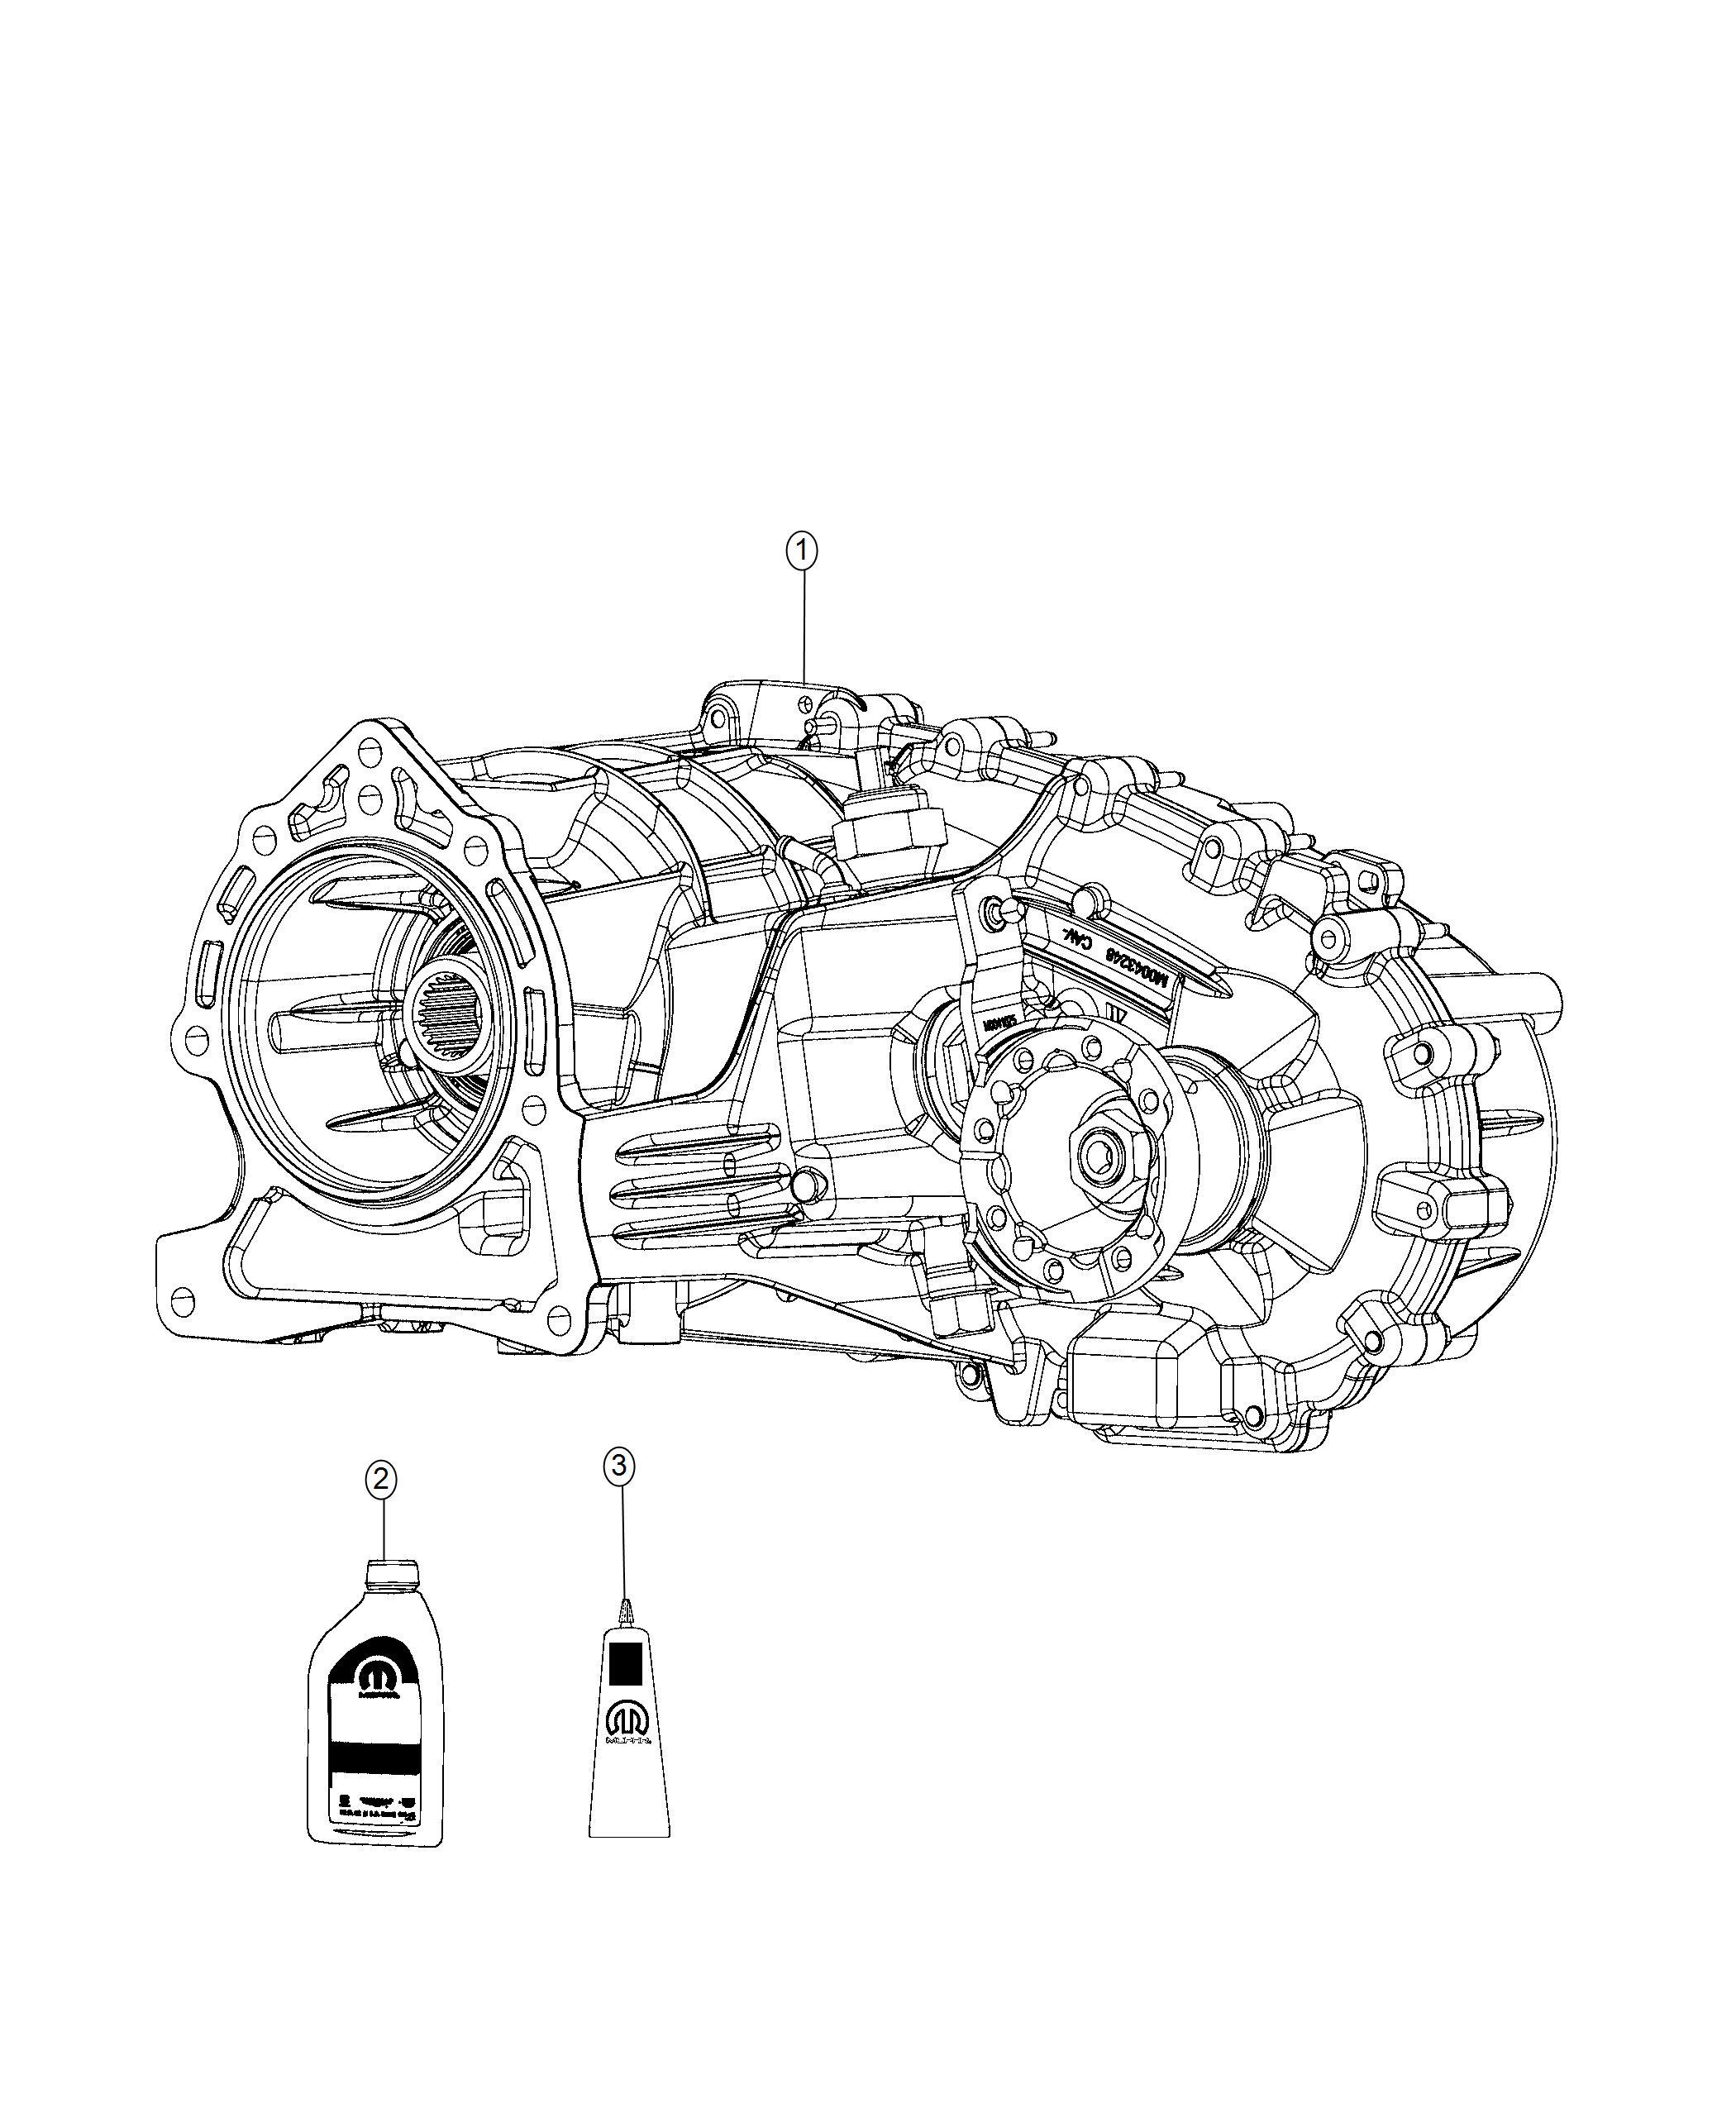 Jeep Wrangler Transfer case. Mp1622c. Trac, time, system